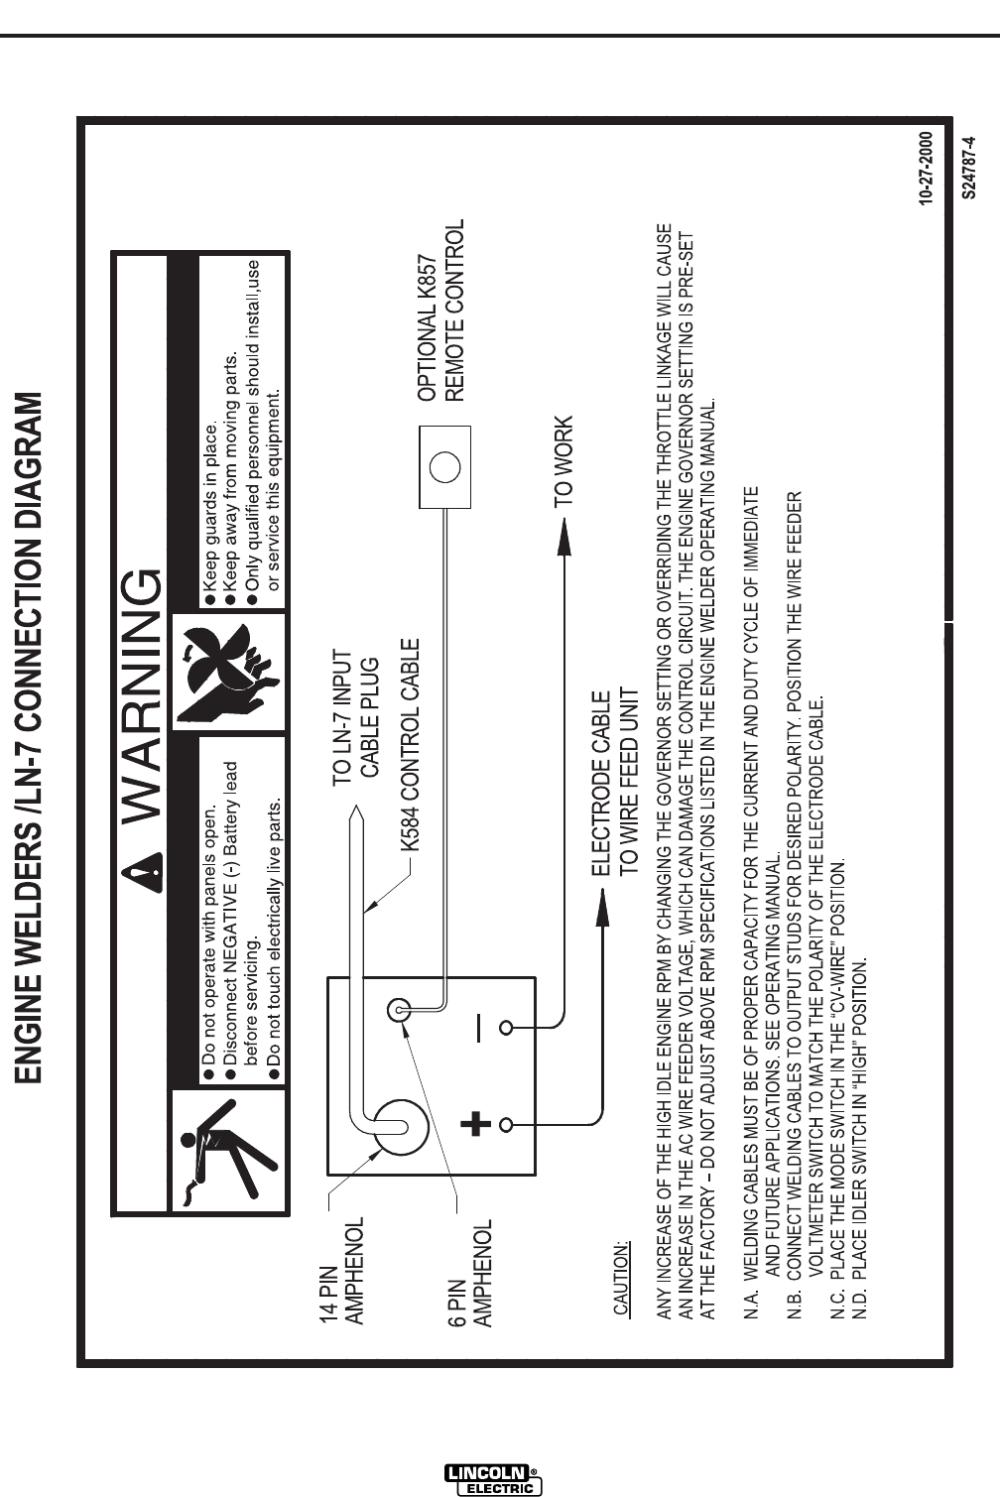 medium resolution of f 4 connection diagrams